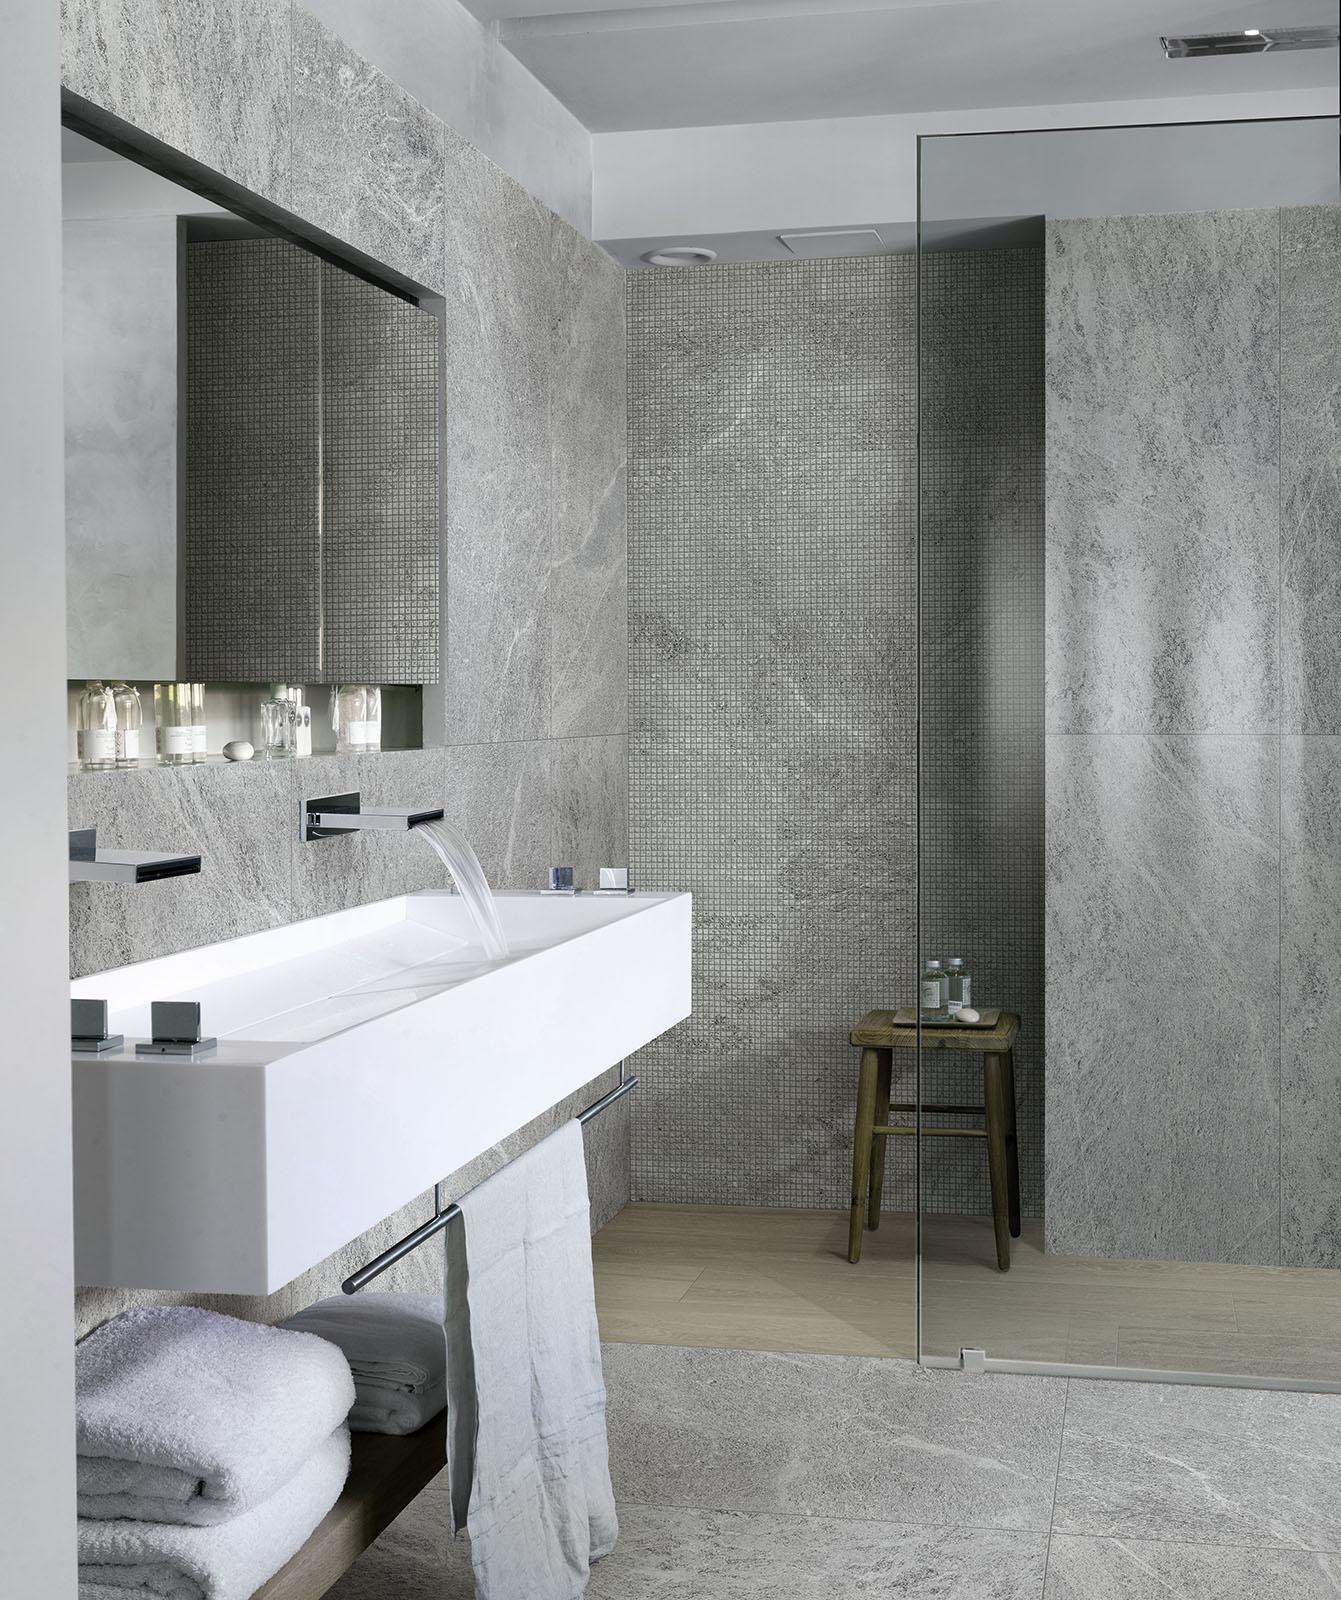 Rivestimento bagno quarzite pannelli finta pietra leroy merlin